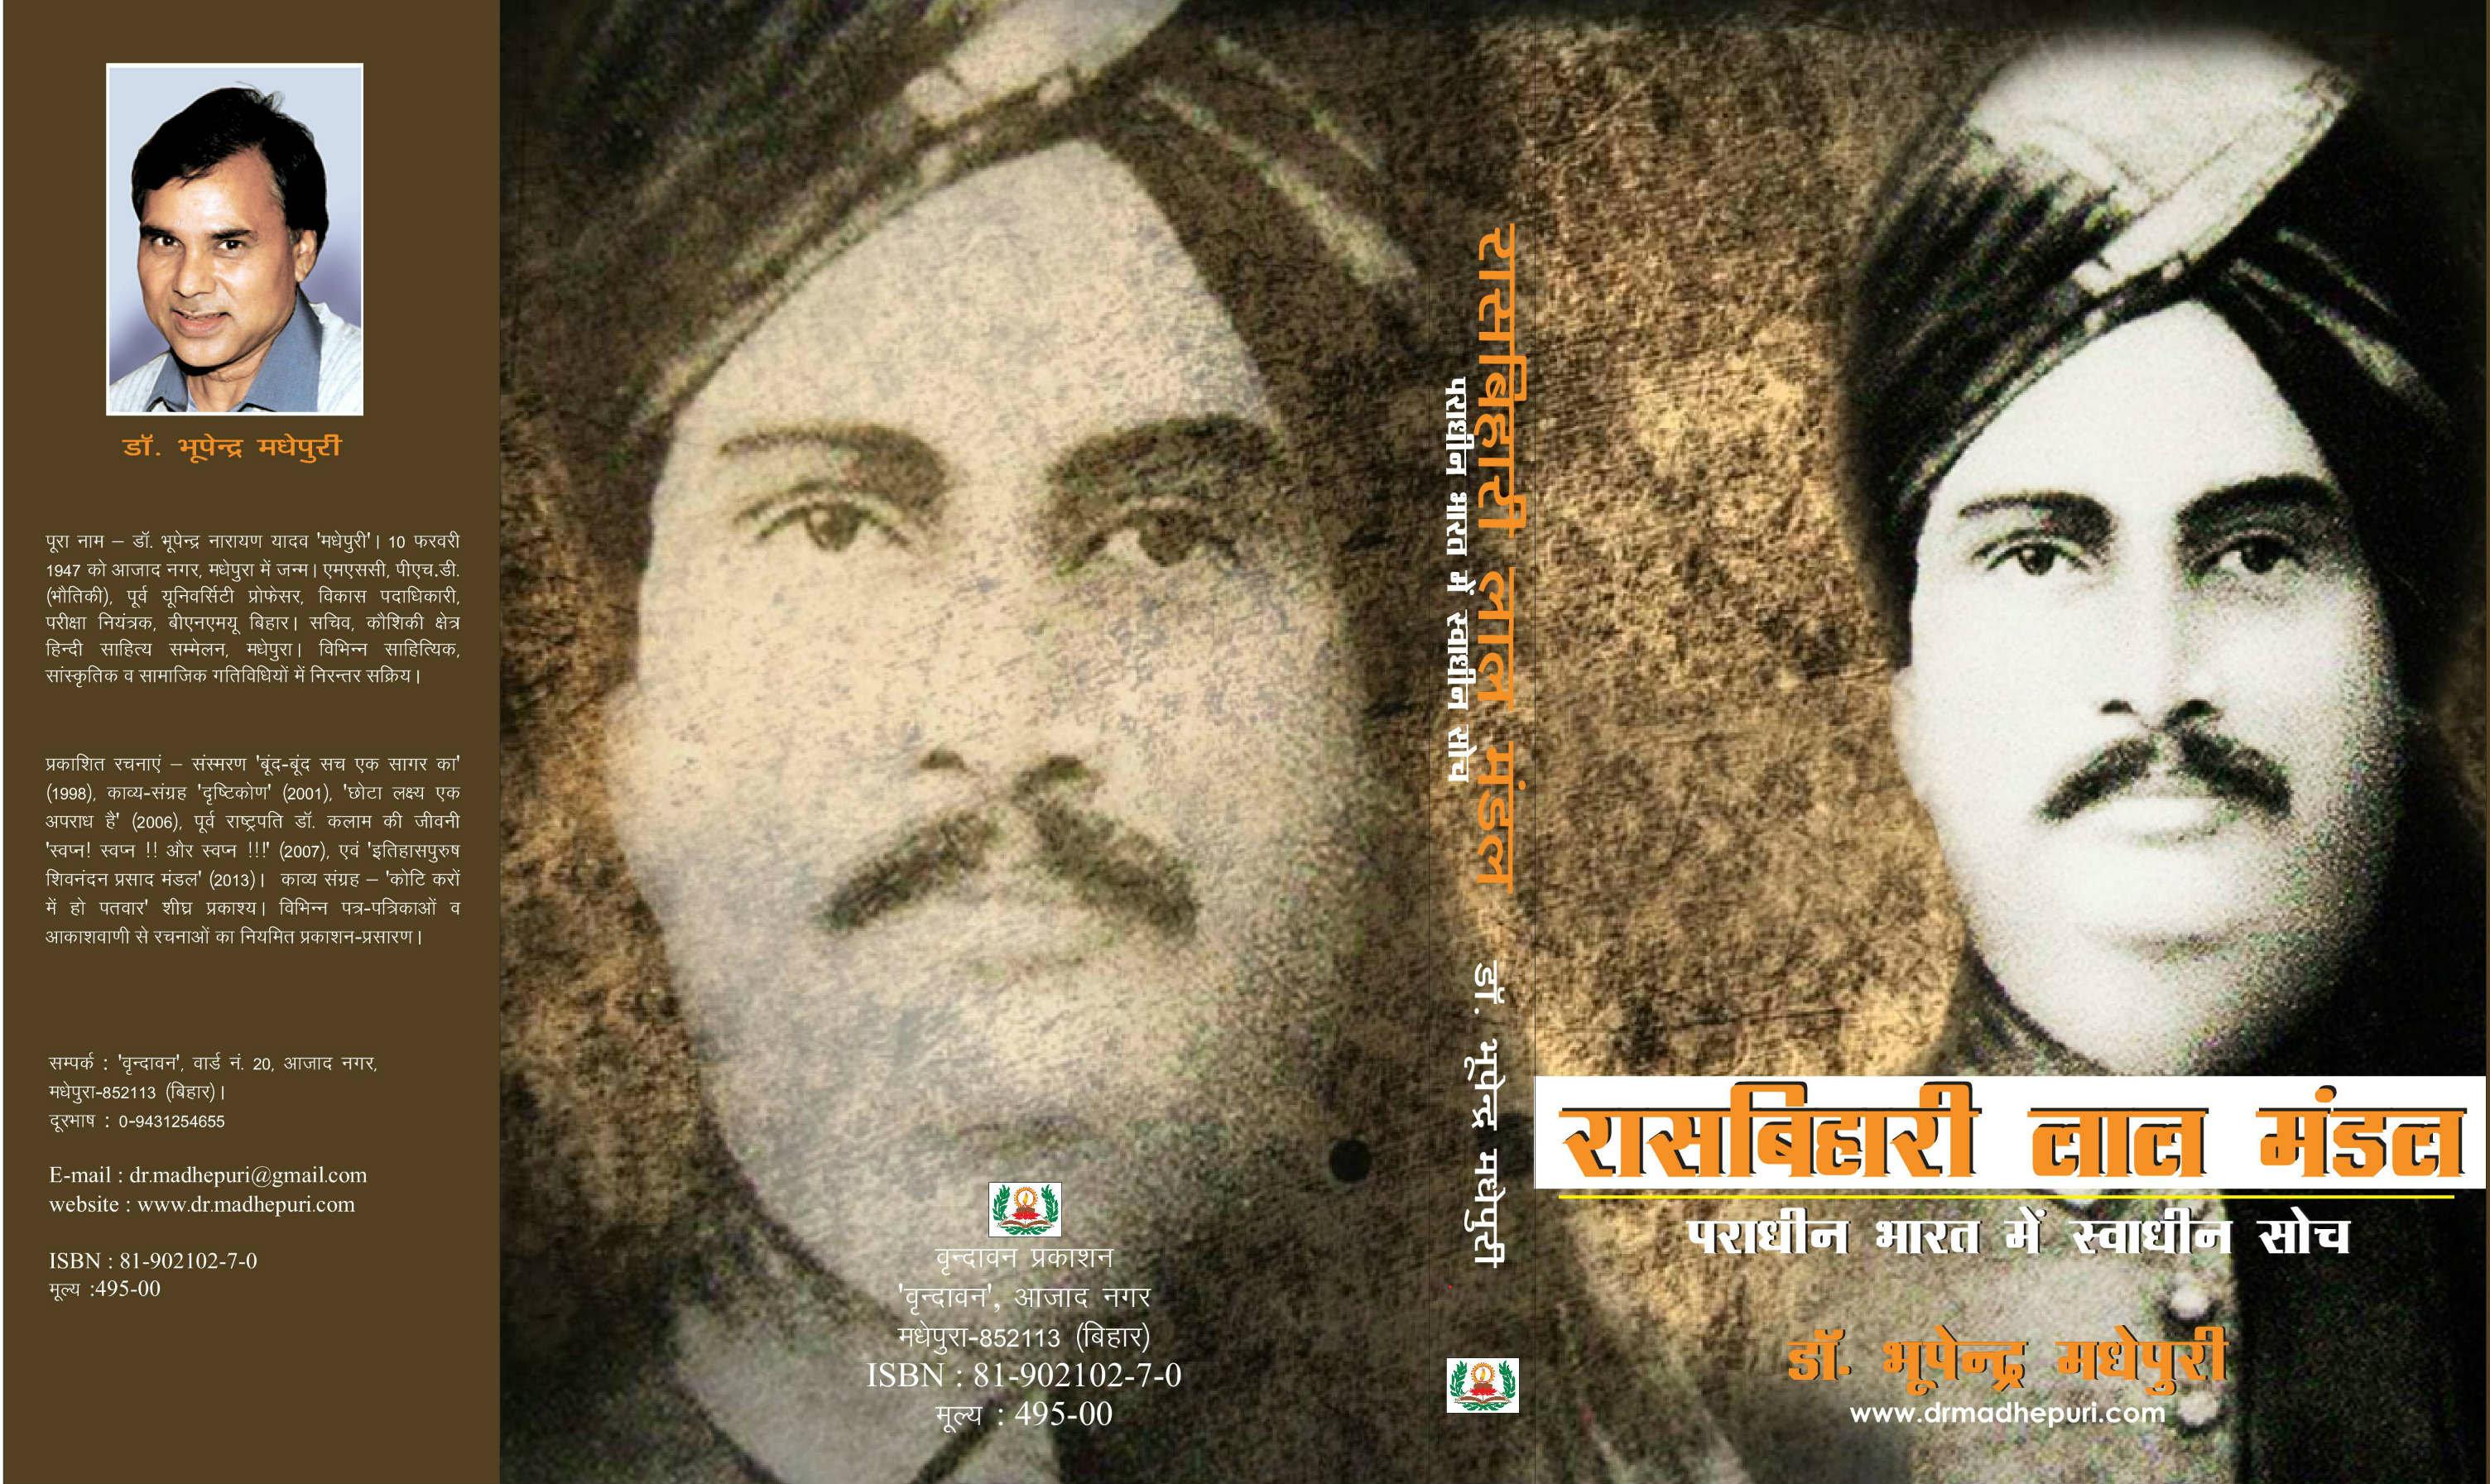 Rasbihari Lal Mandal- Paradhin Bharat Mein Swadhin Soch